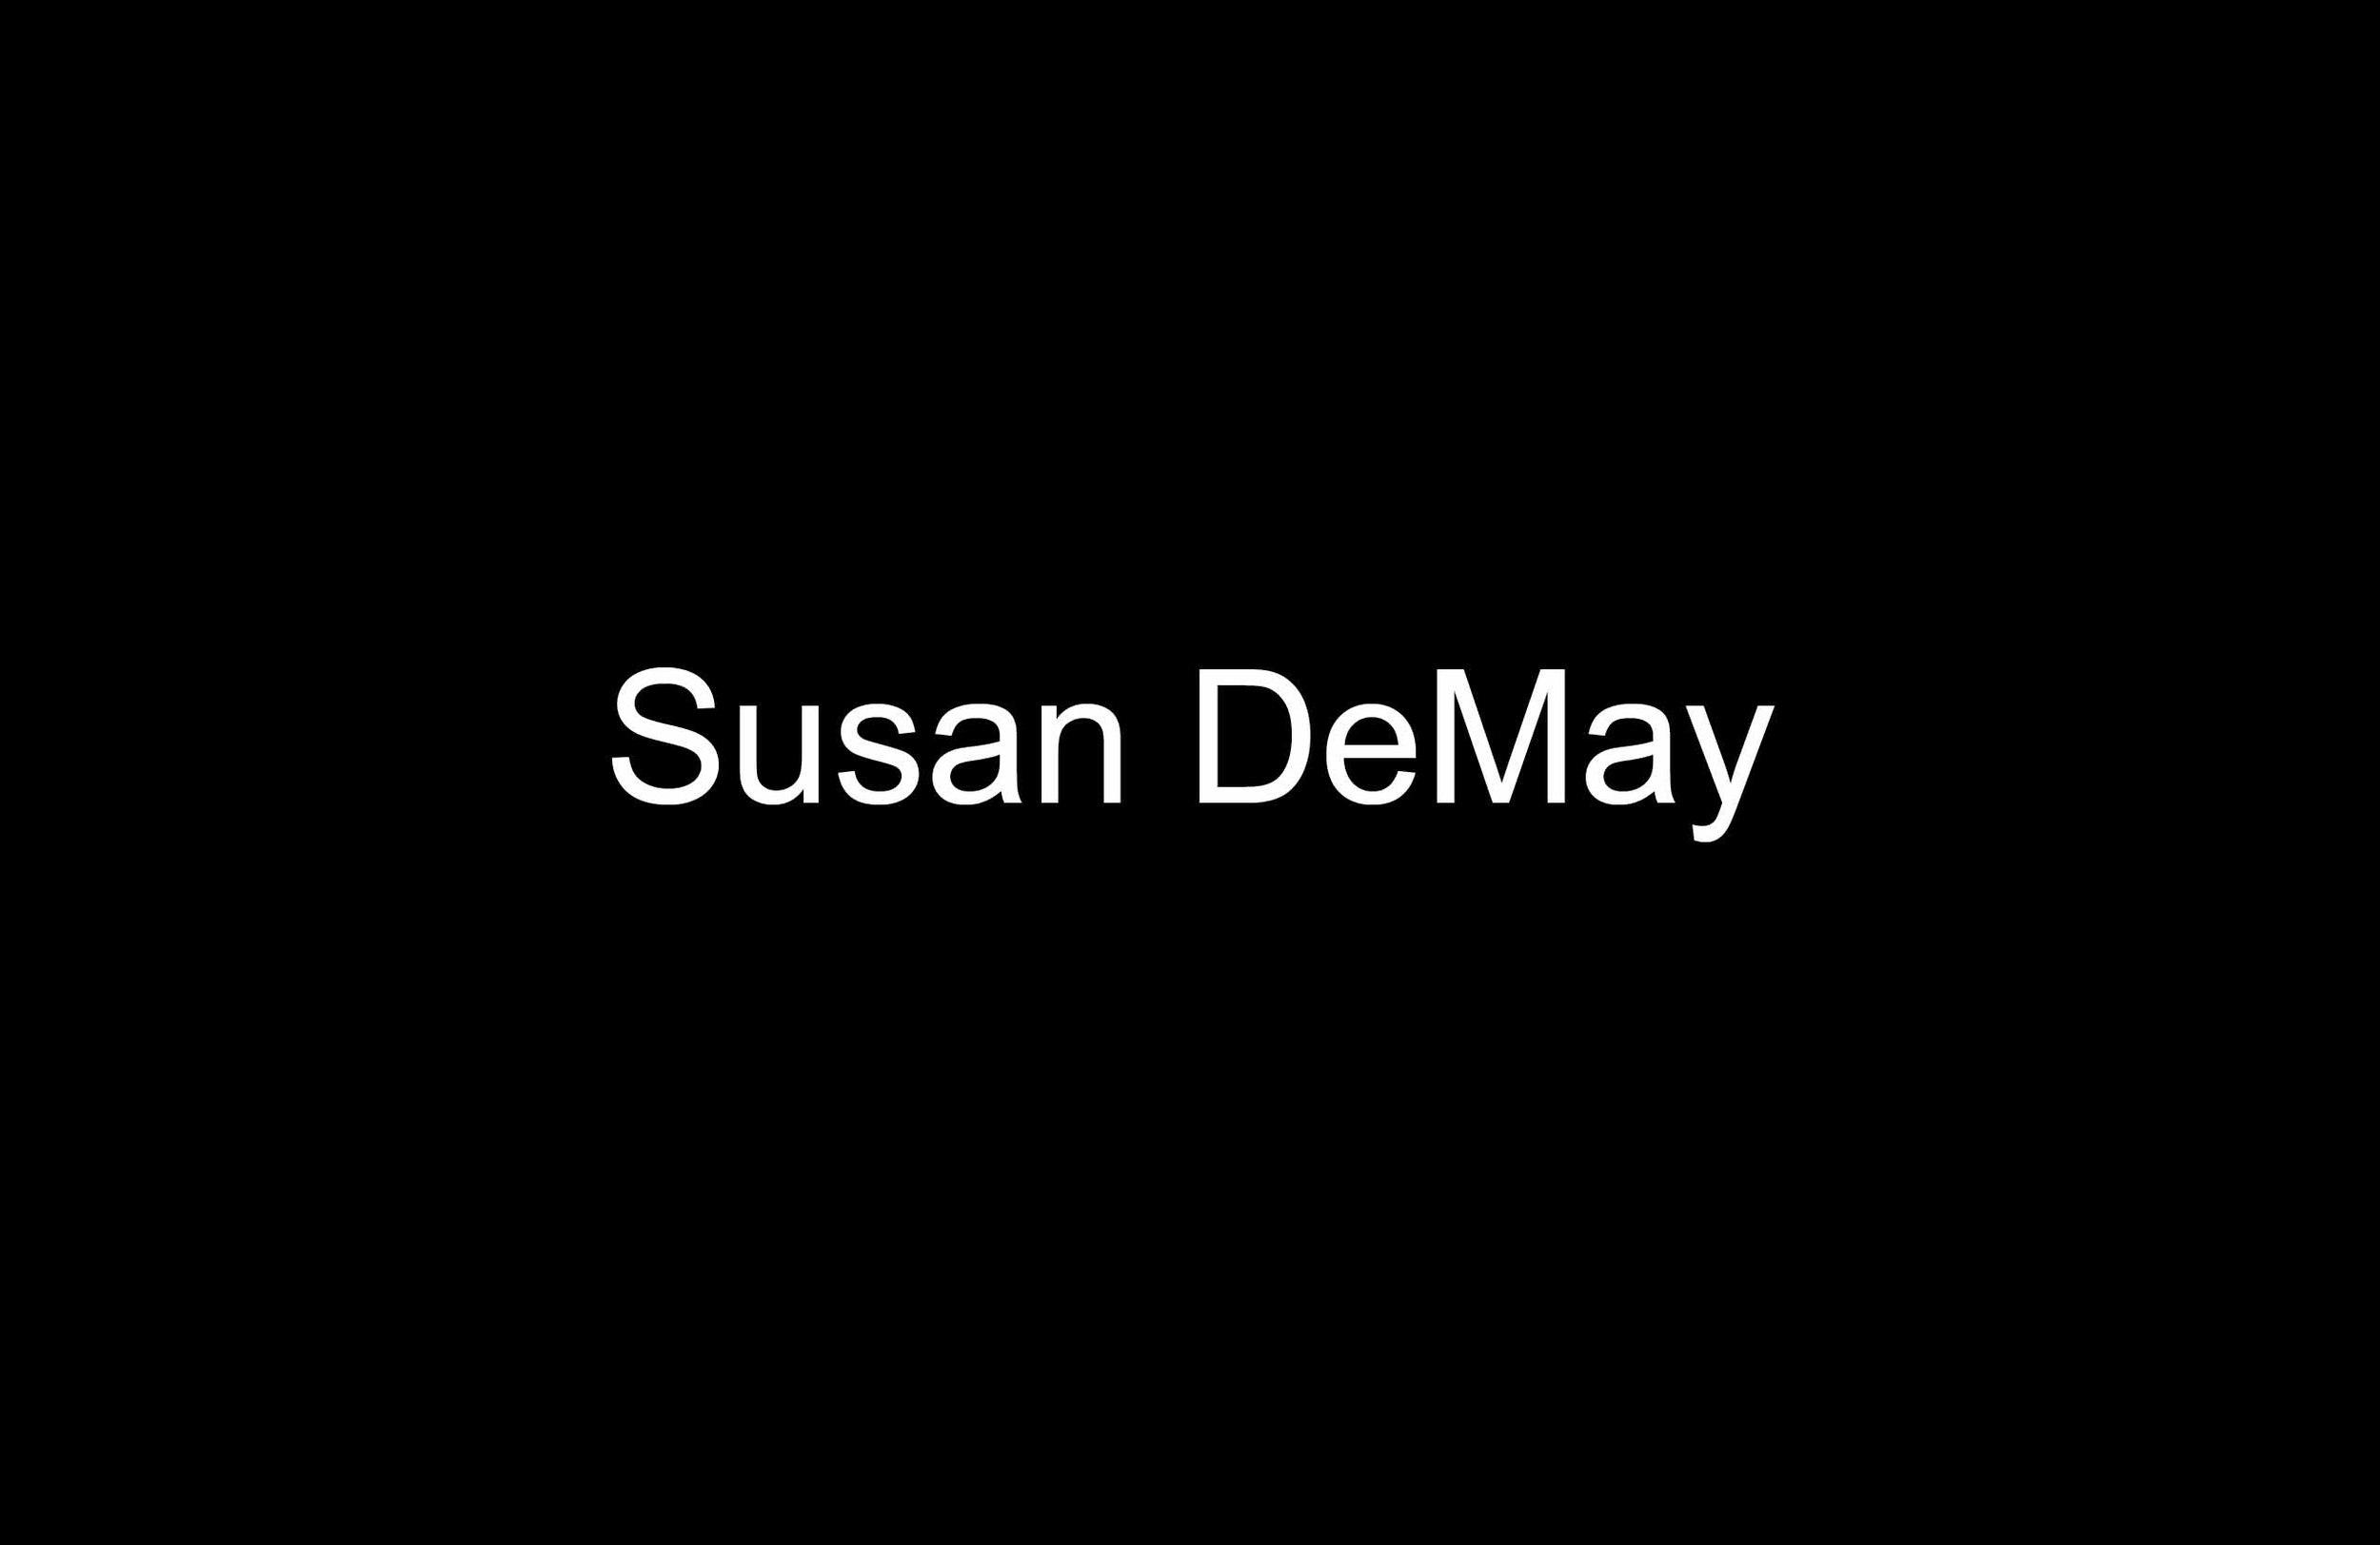 Susan DeMay Divider.jpg